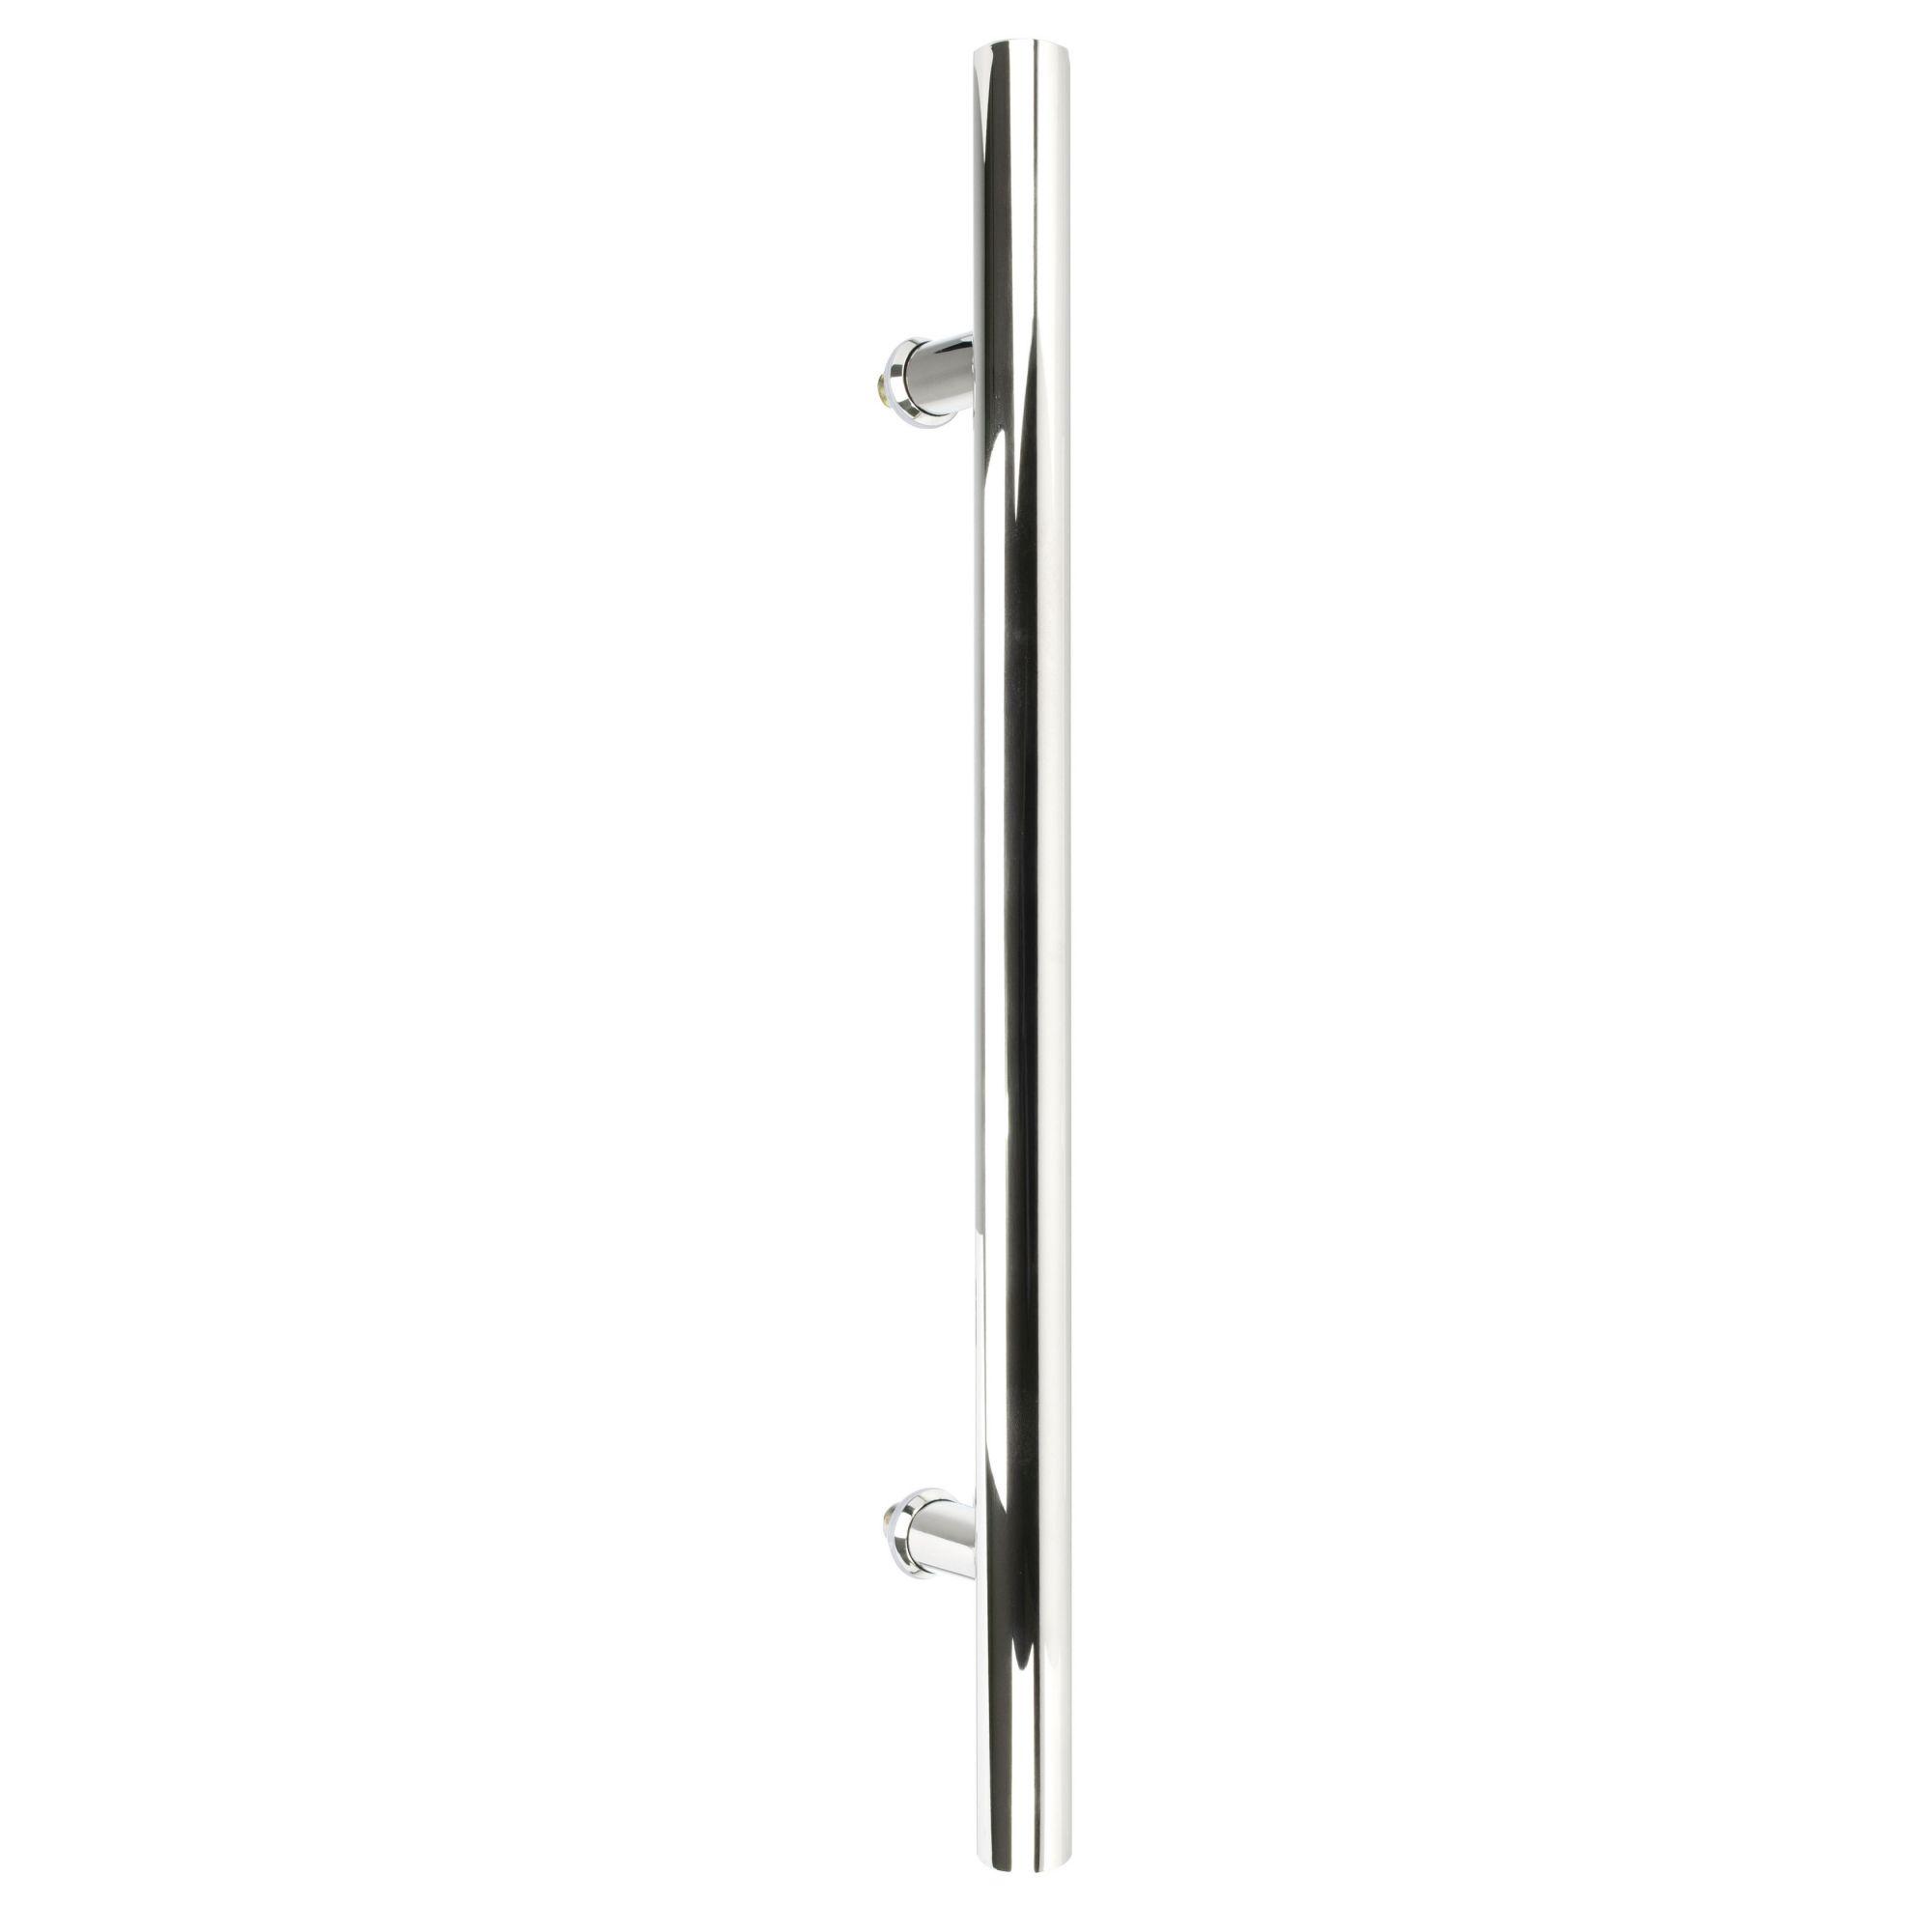 Puxador inox para porta madeira e vidro tubular redondo 1,20x1,50m H05